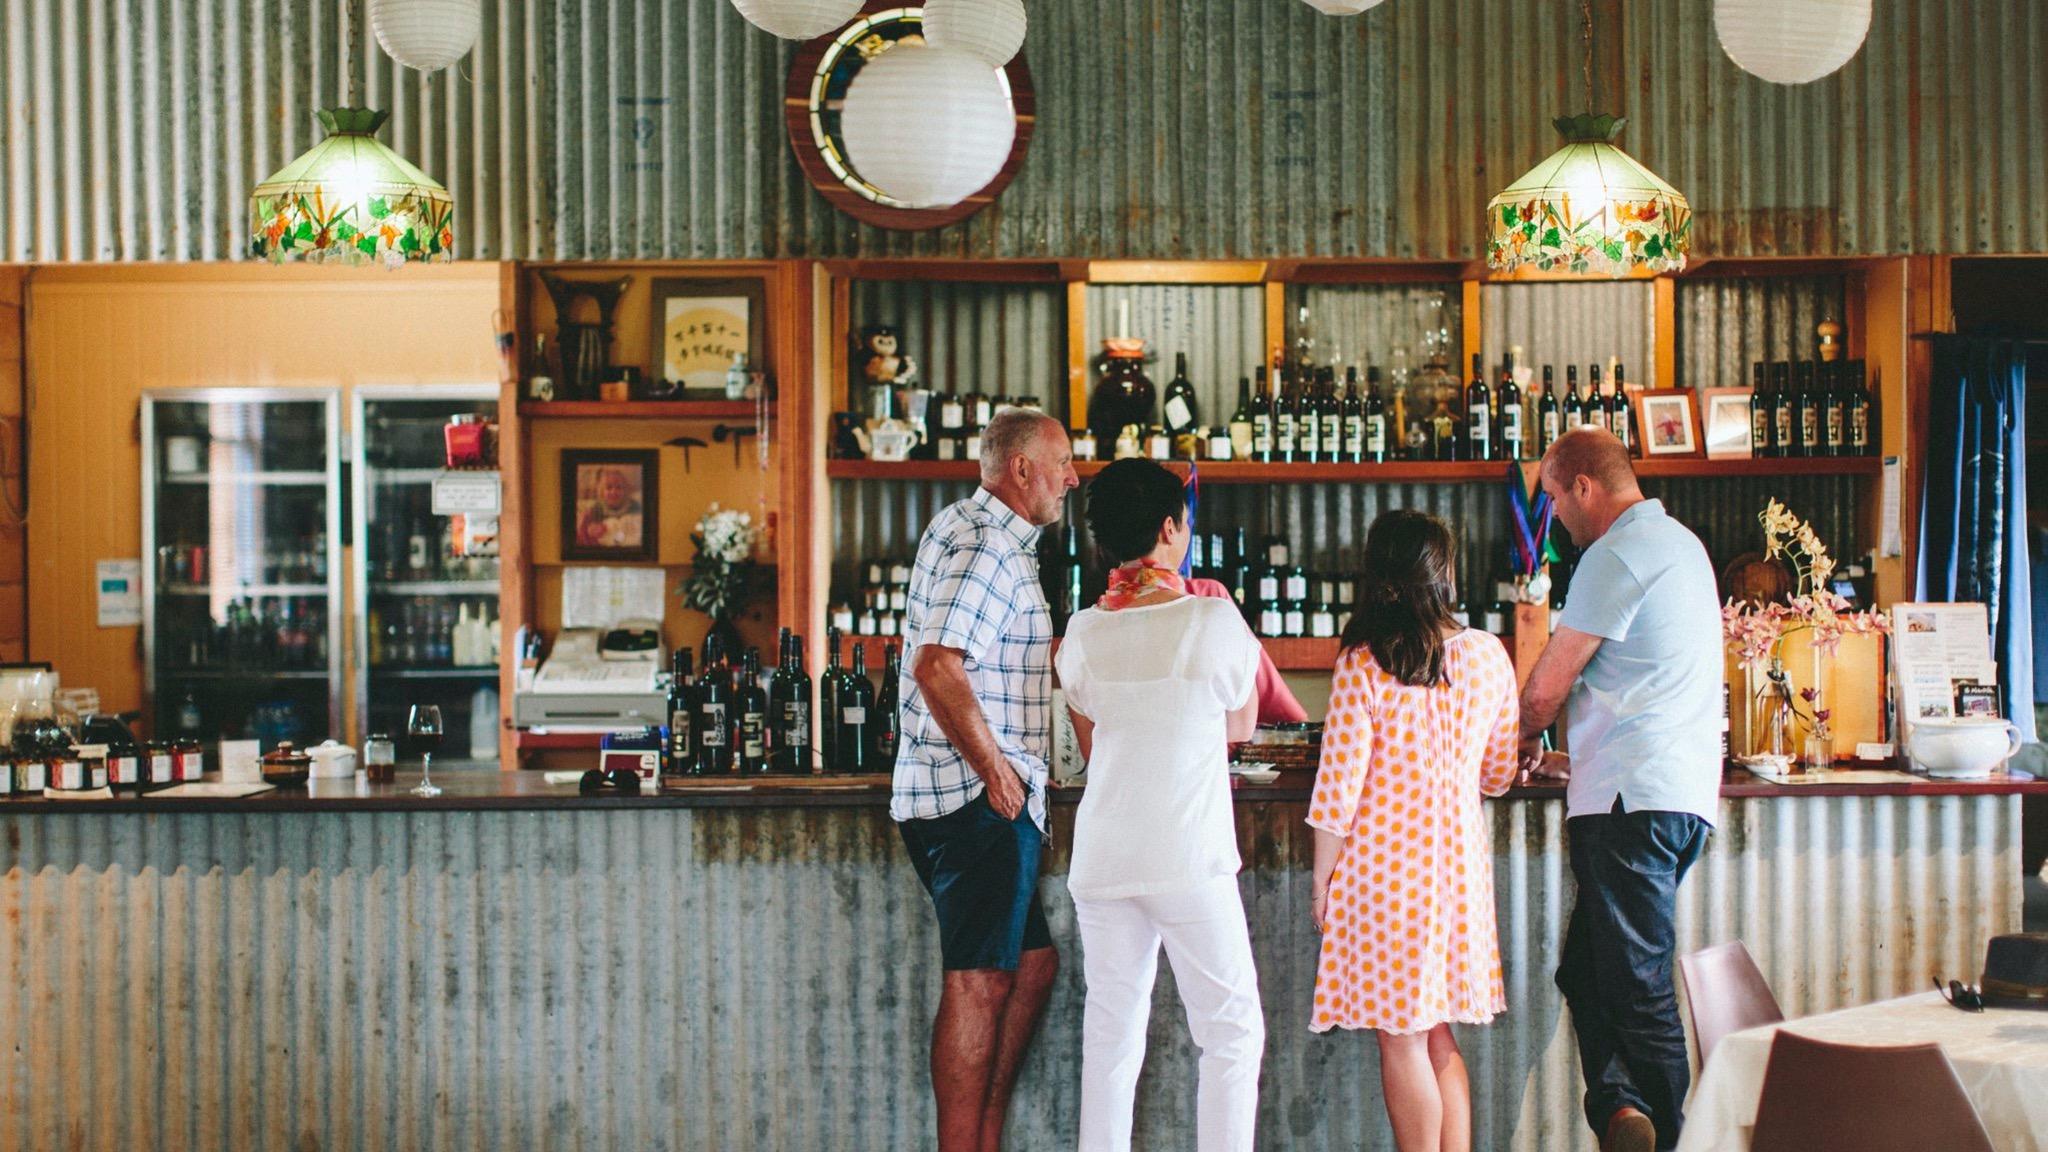 Customers tasting at Wicked Virgin Olives